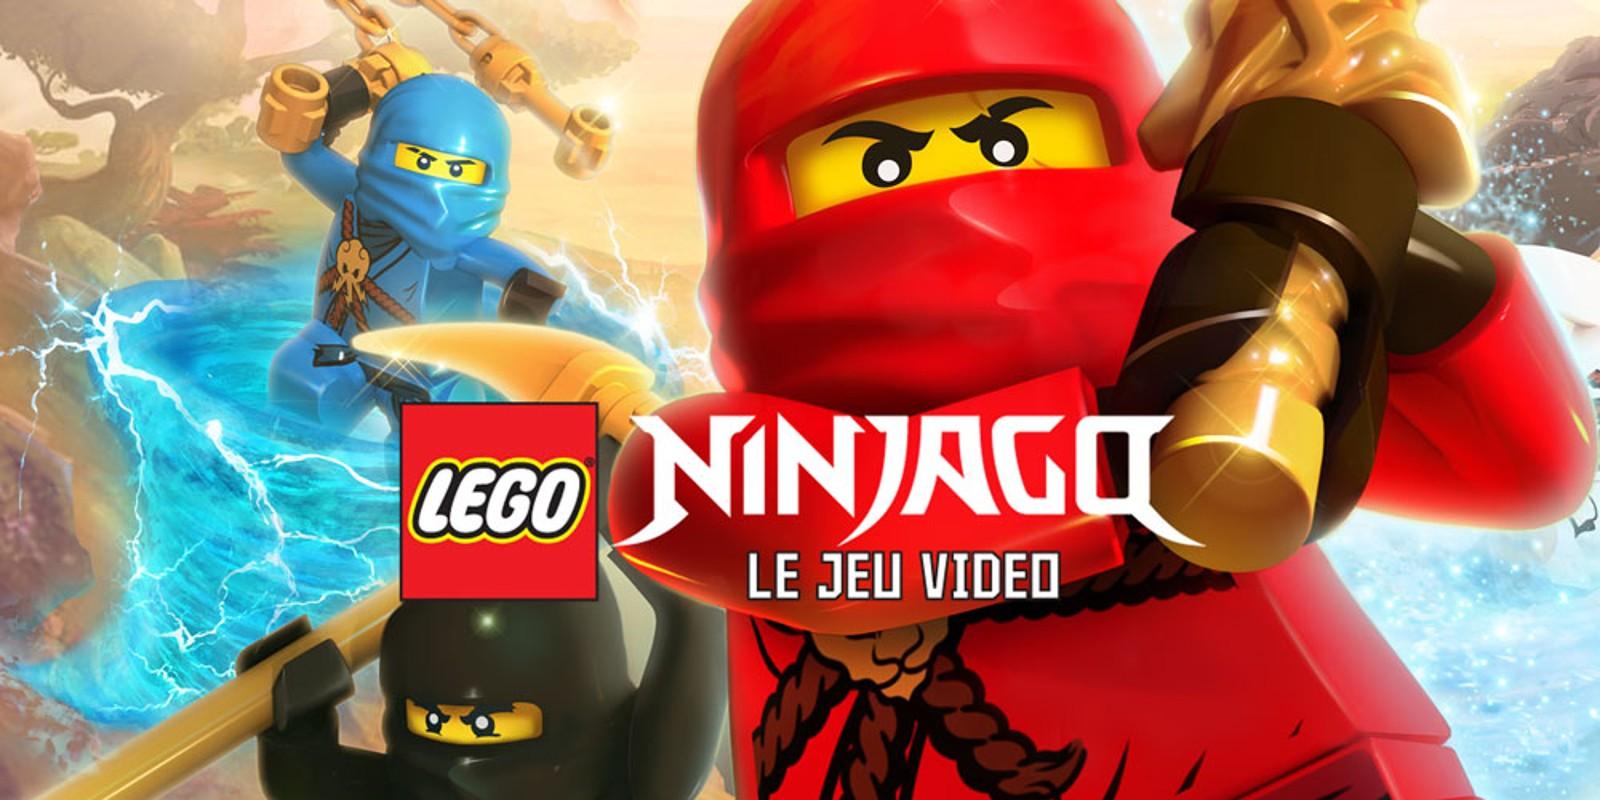 Lego ninjago le jeu vid o nintendo ds jeux nintendo - Lego inazuma eleven ...